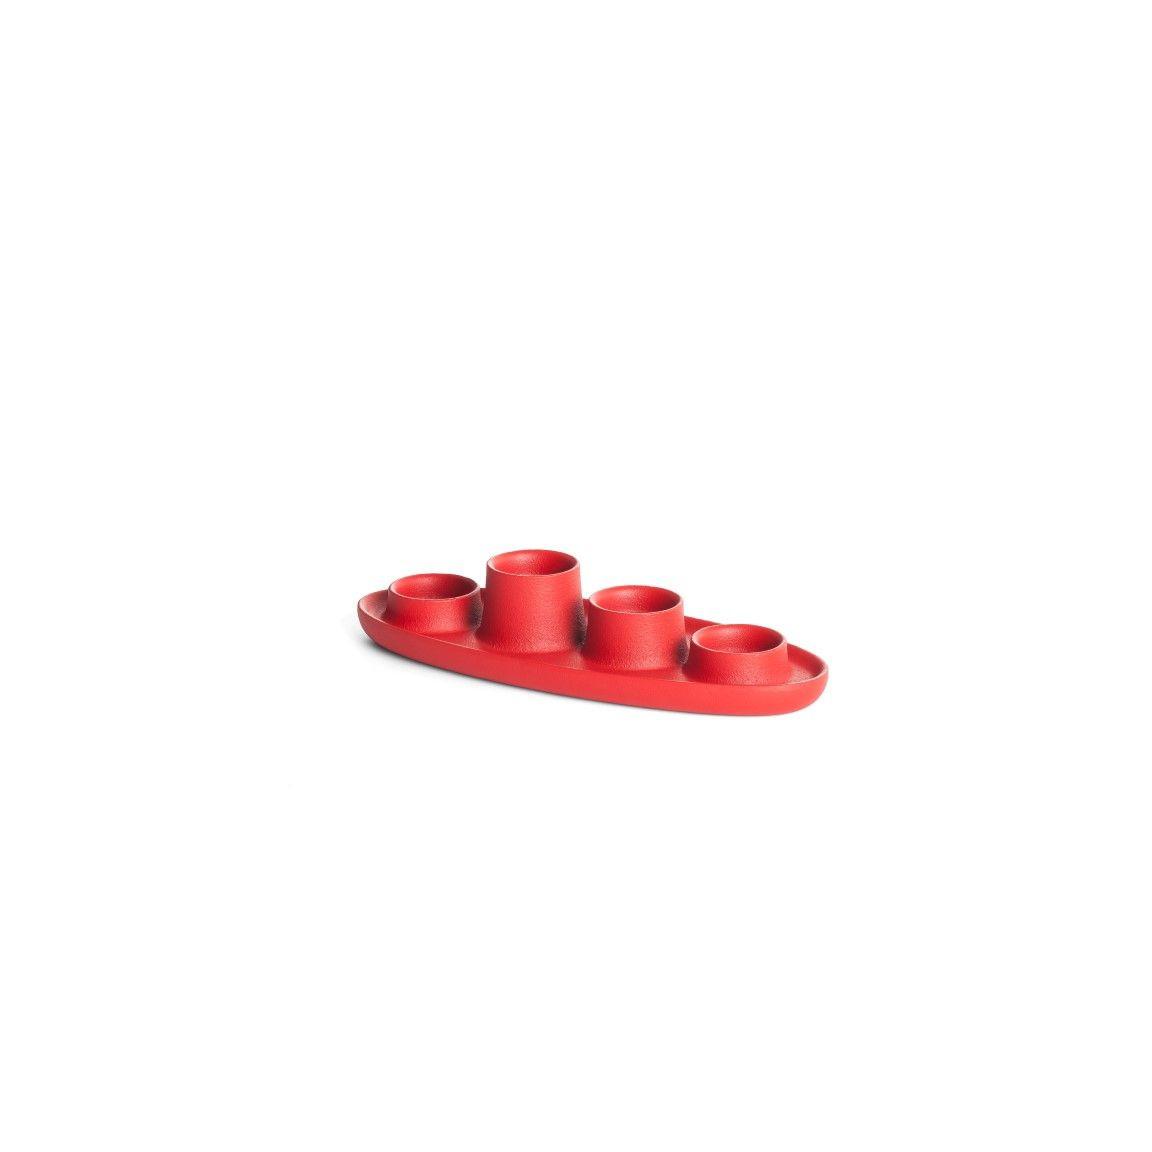 Kerzenhalter für 4 Kerzen | Rot